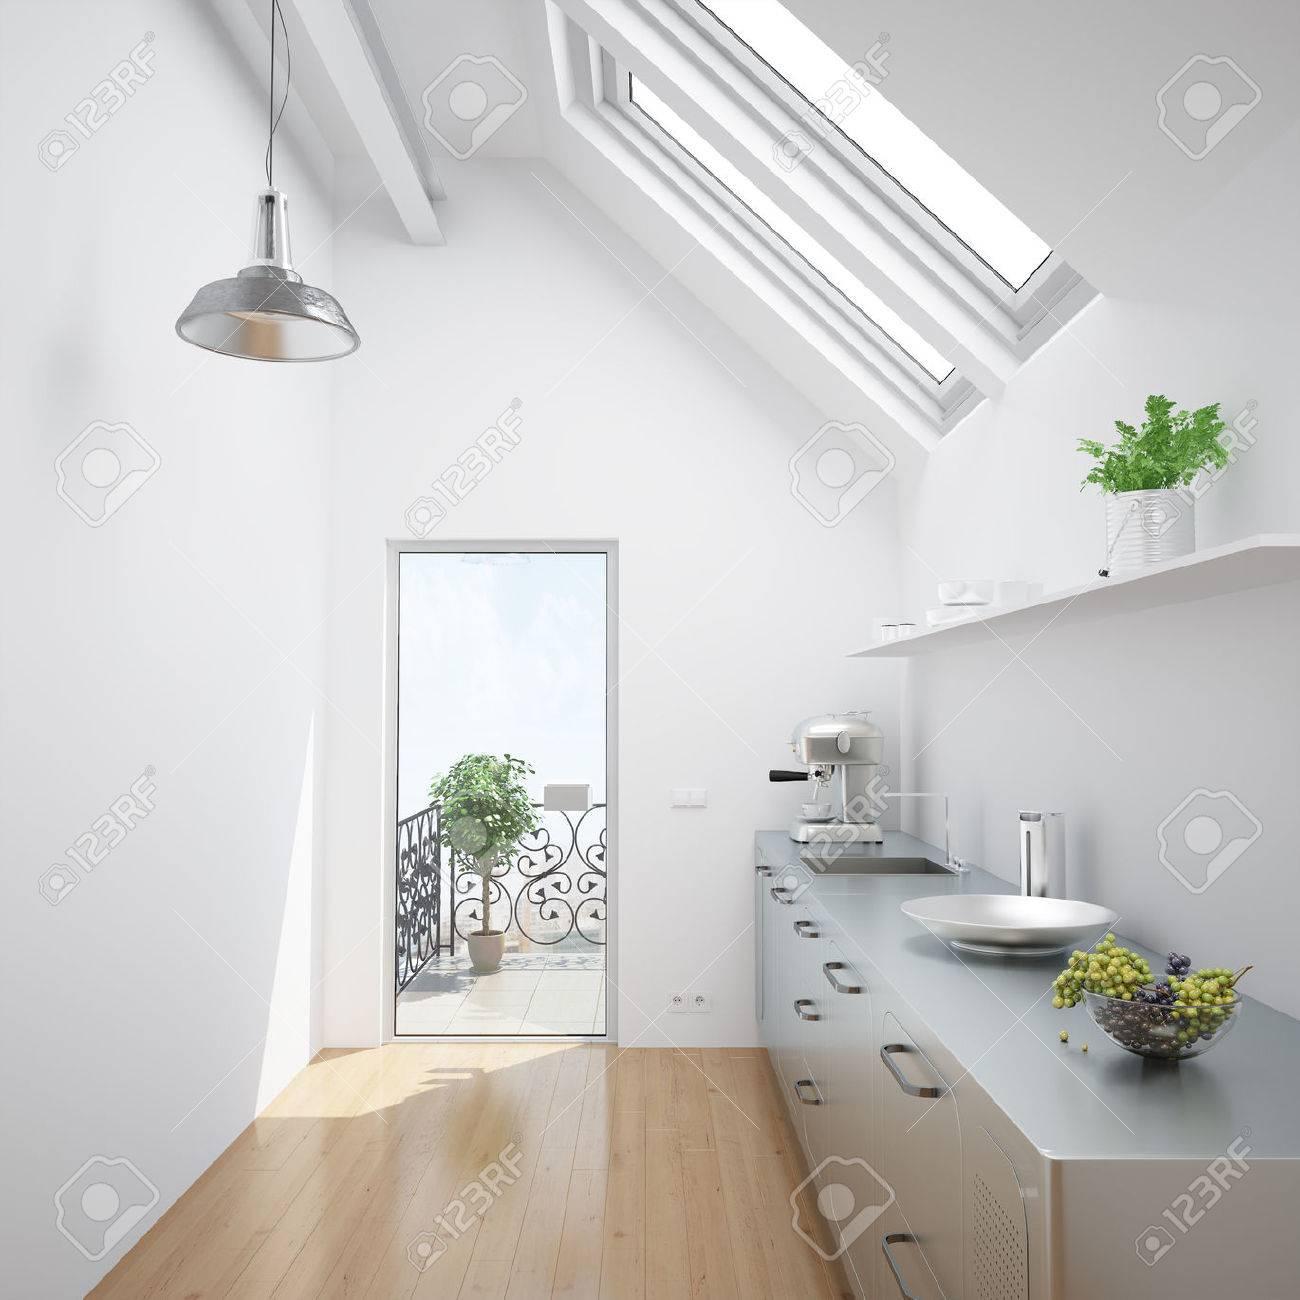 Bright White Kitchen In An Small Attic Apartment Stock Photo